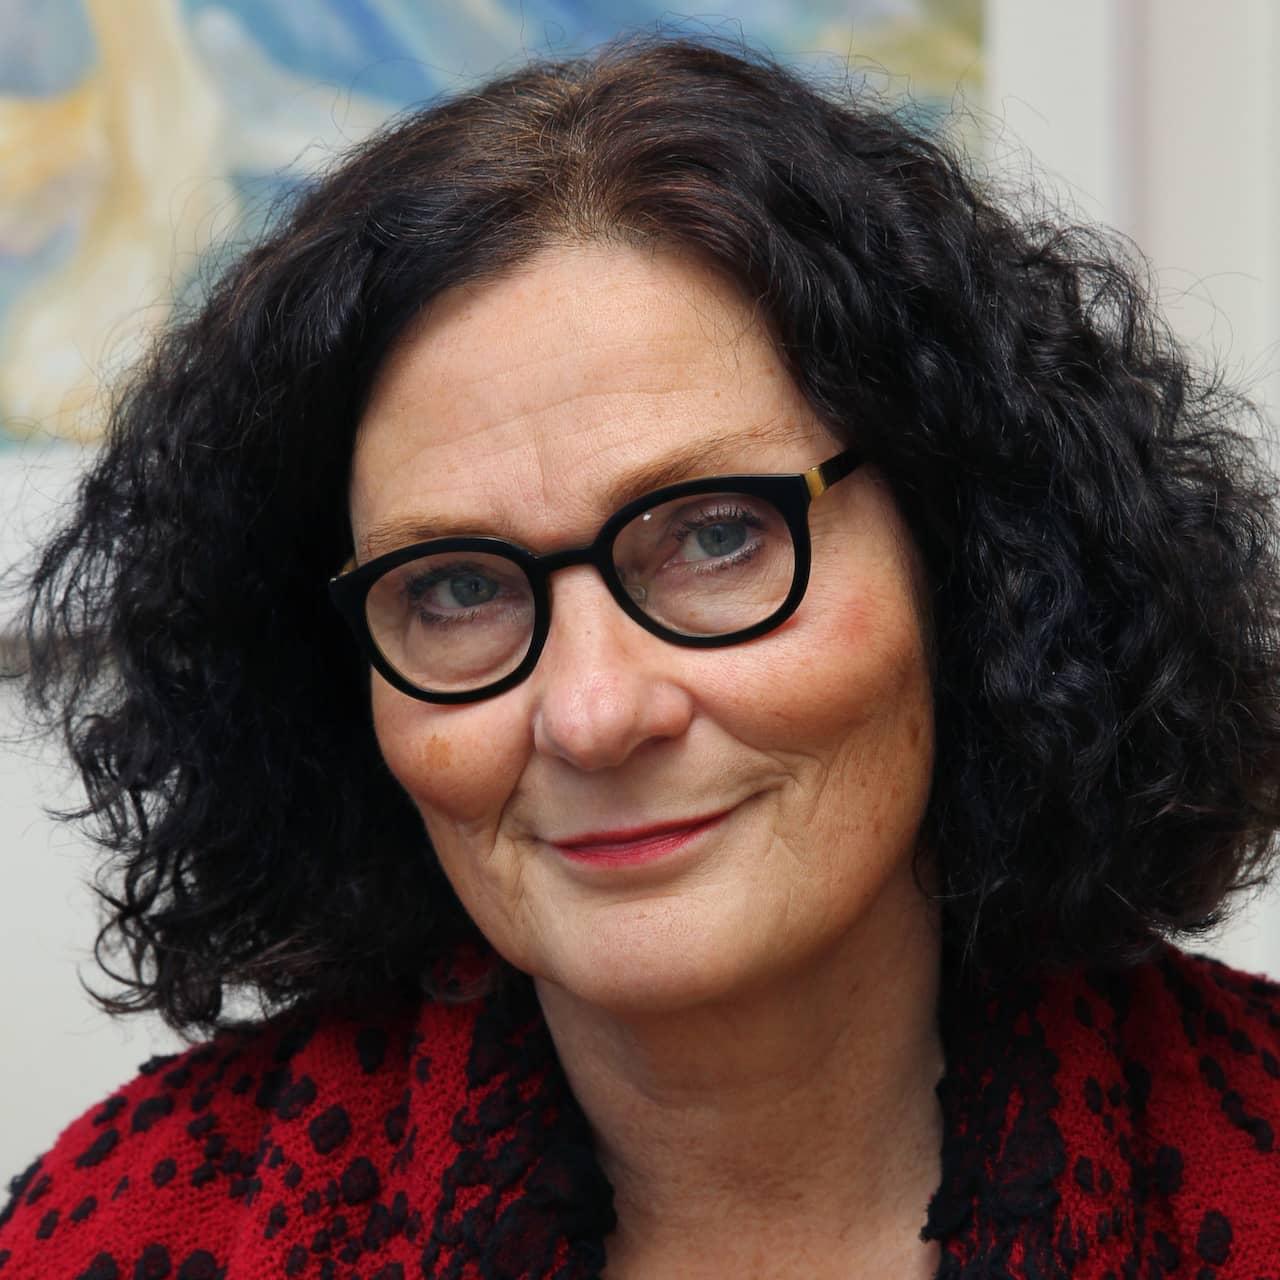 2. Ebba Witt-Brattström